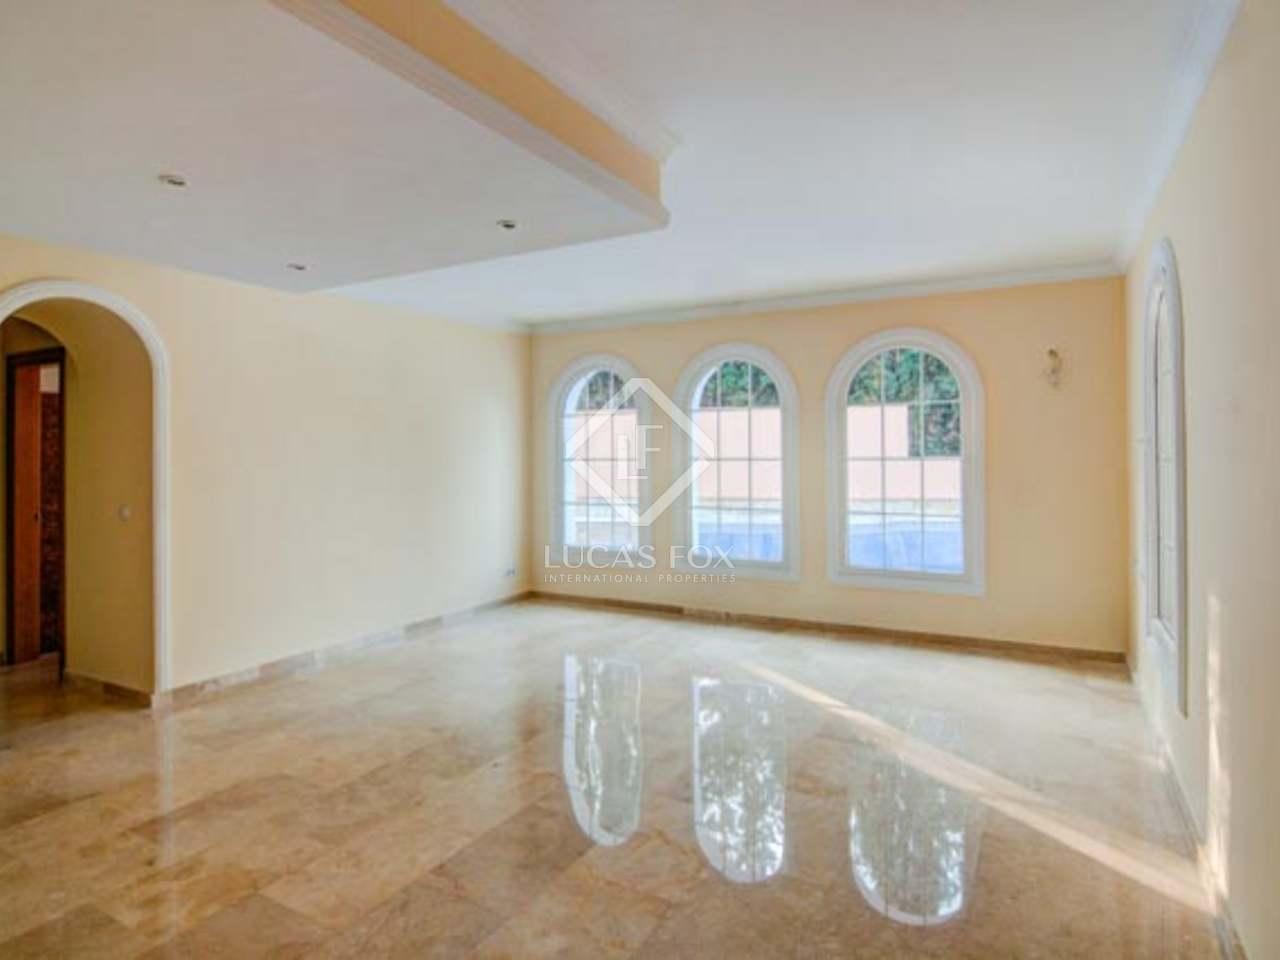 5 Bedroom Villa For Sale In La Sierrezuela Mijas Costa